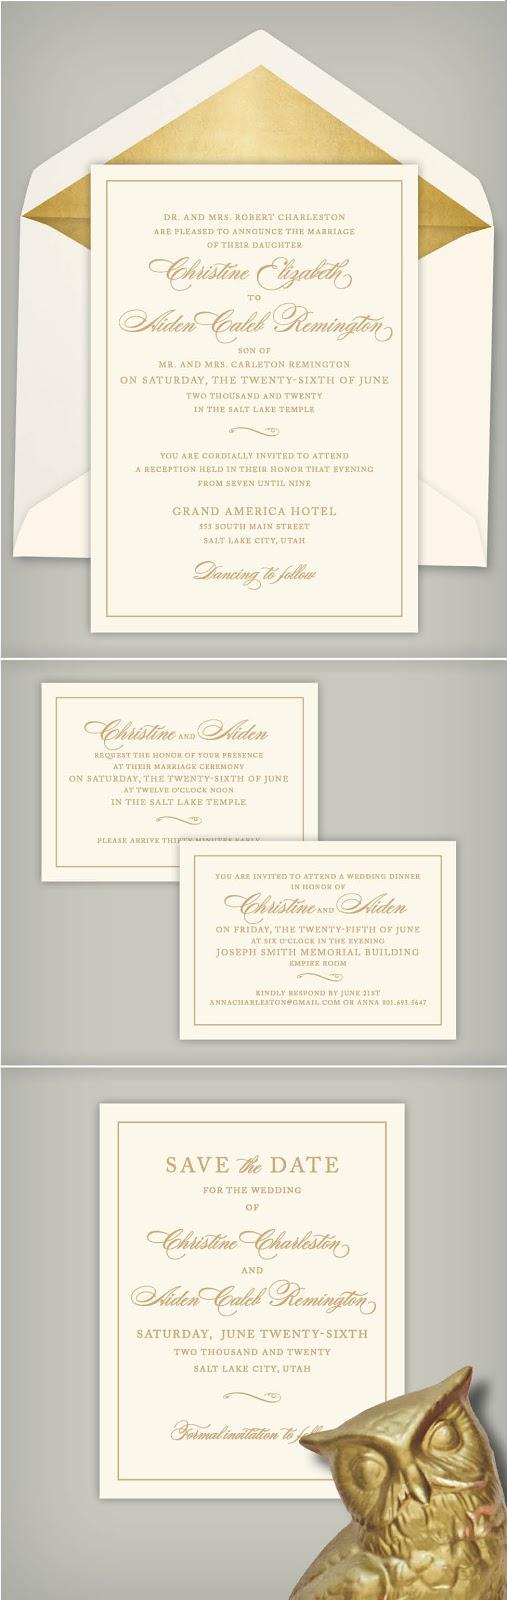 Wedding Invitation Blog